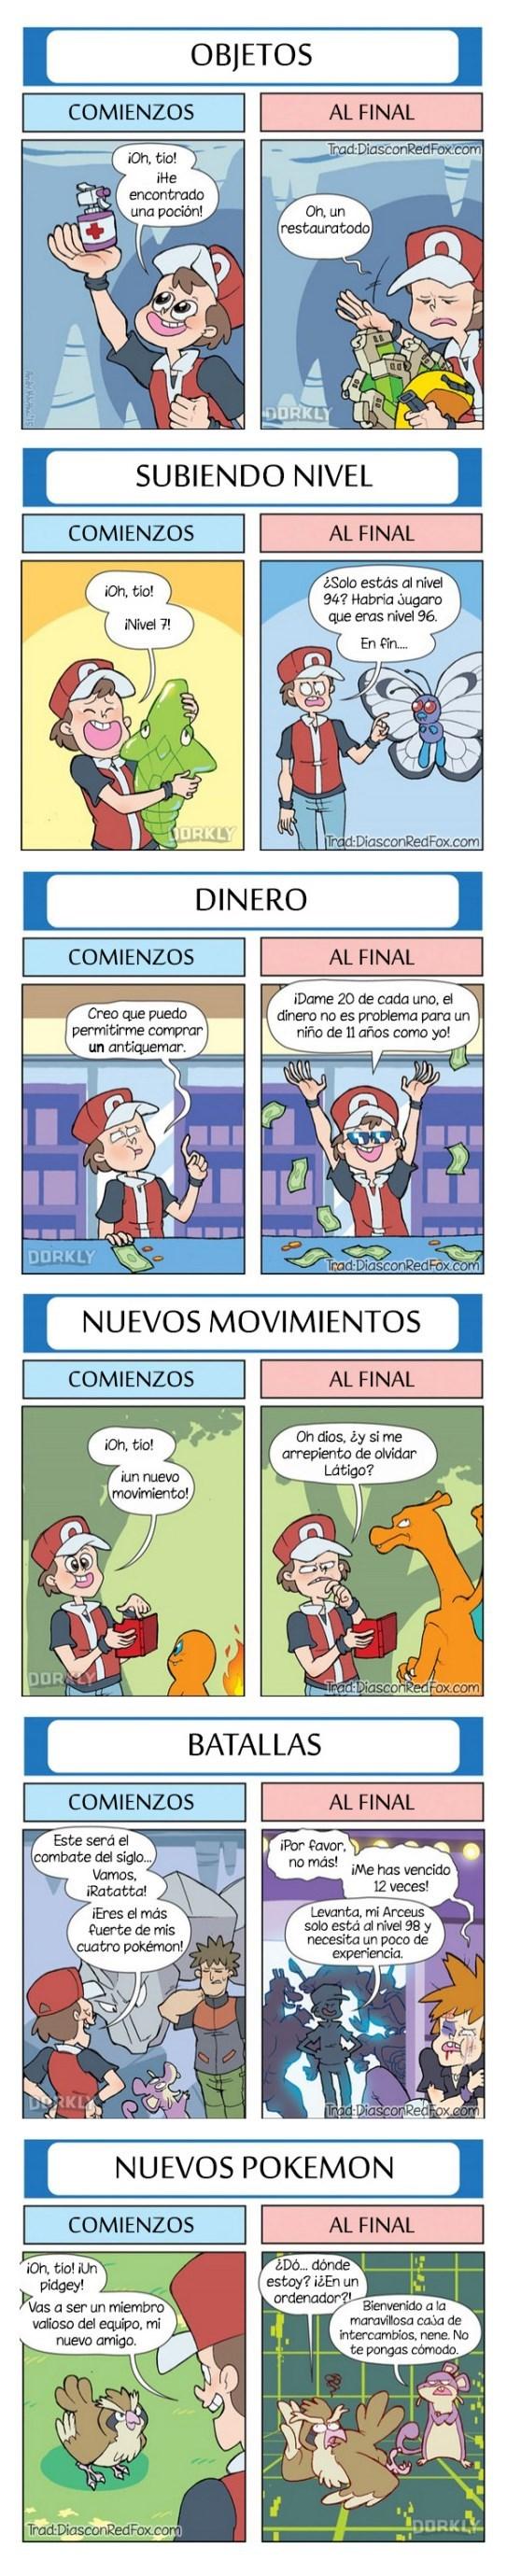 maestro pokemon